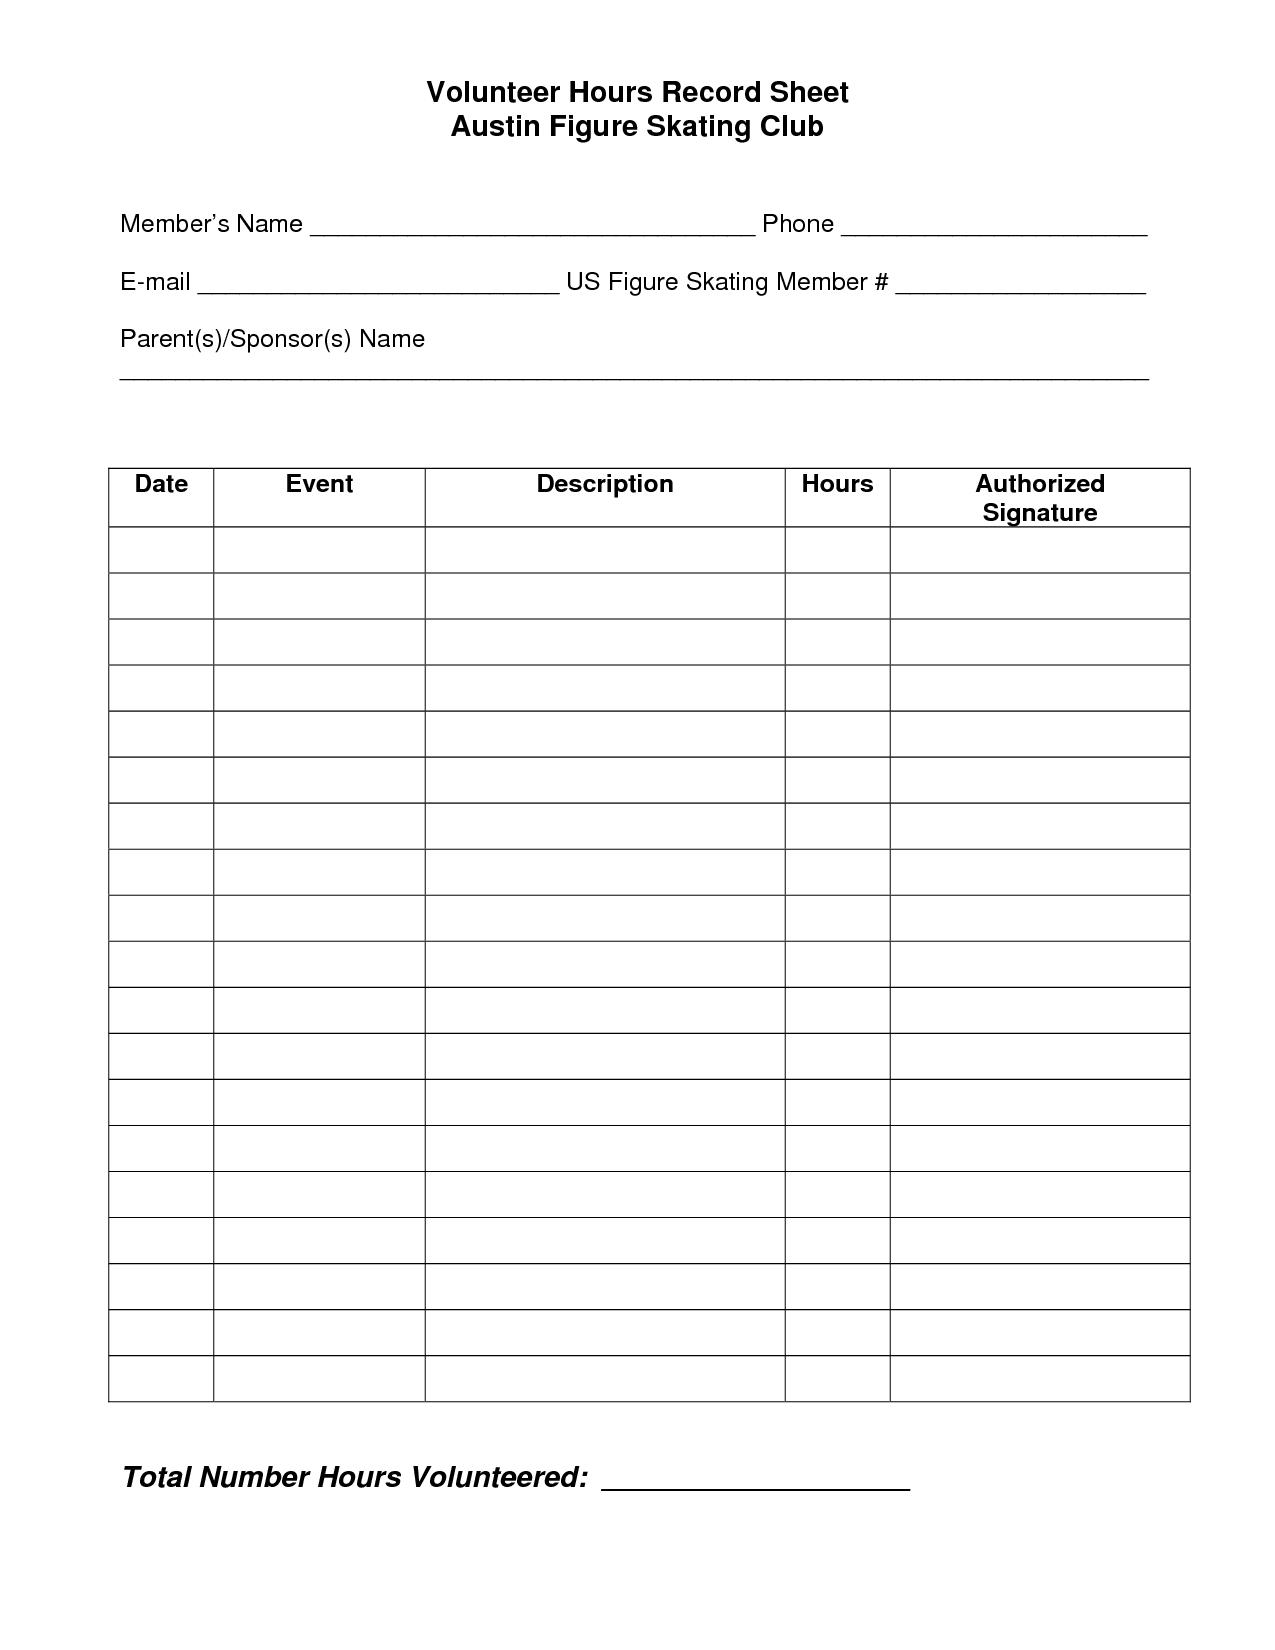 Volunteer Hours Log Sheet Template | Spreedsheets | Pinterest - Free Printable Community Service Log Sheet